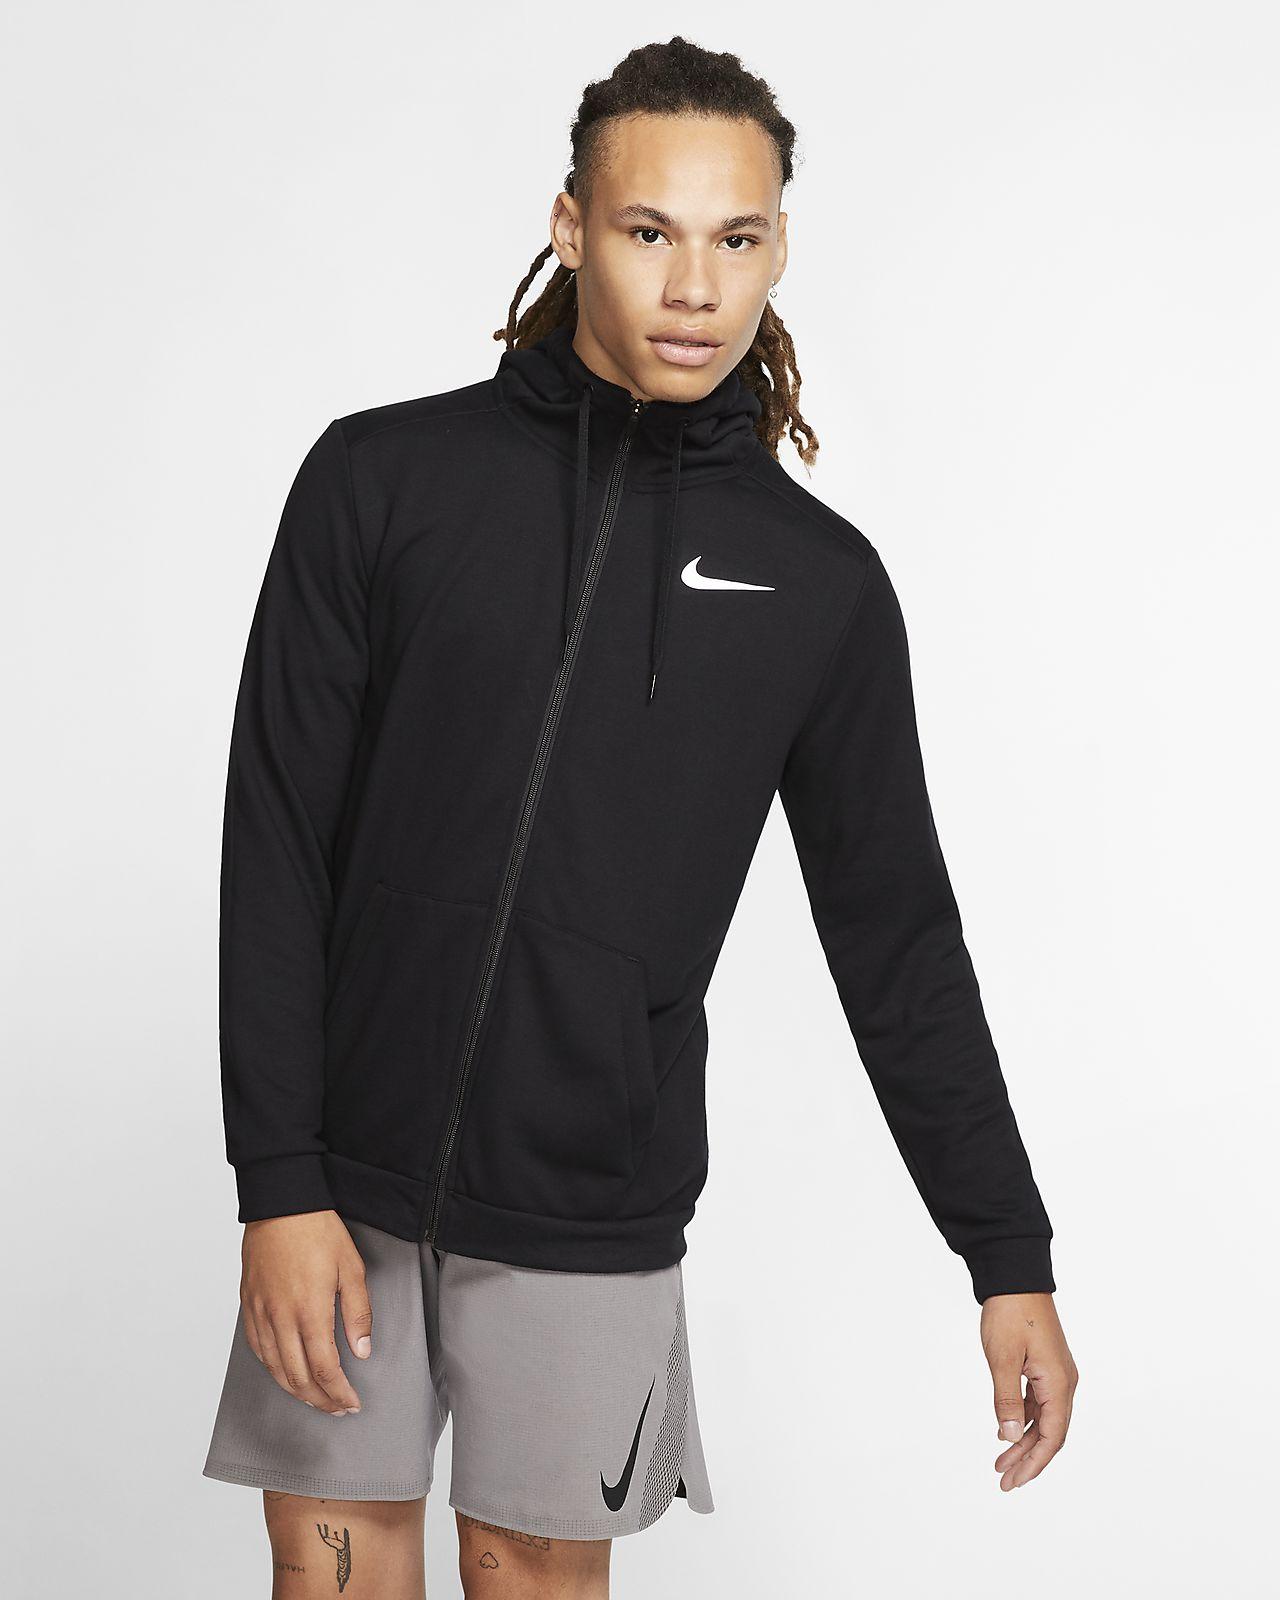 Nike Dri-FIT 男款全長式拉鍊訓練連帽上衣